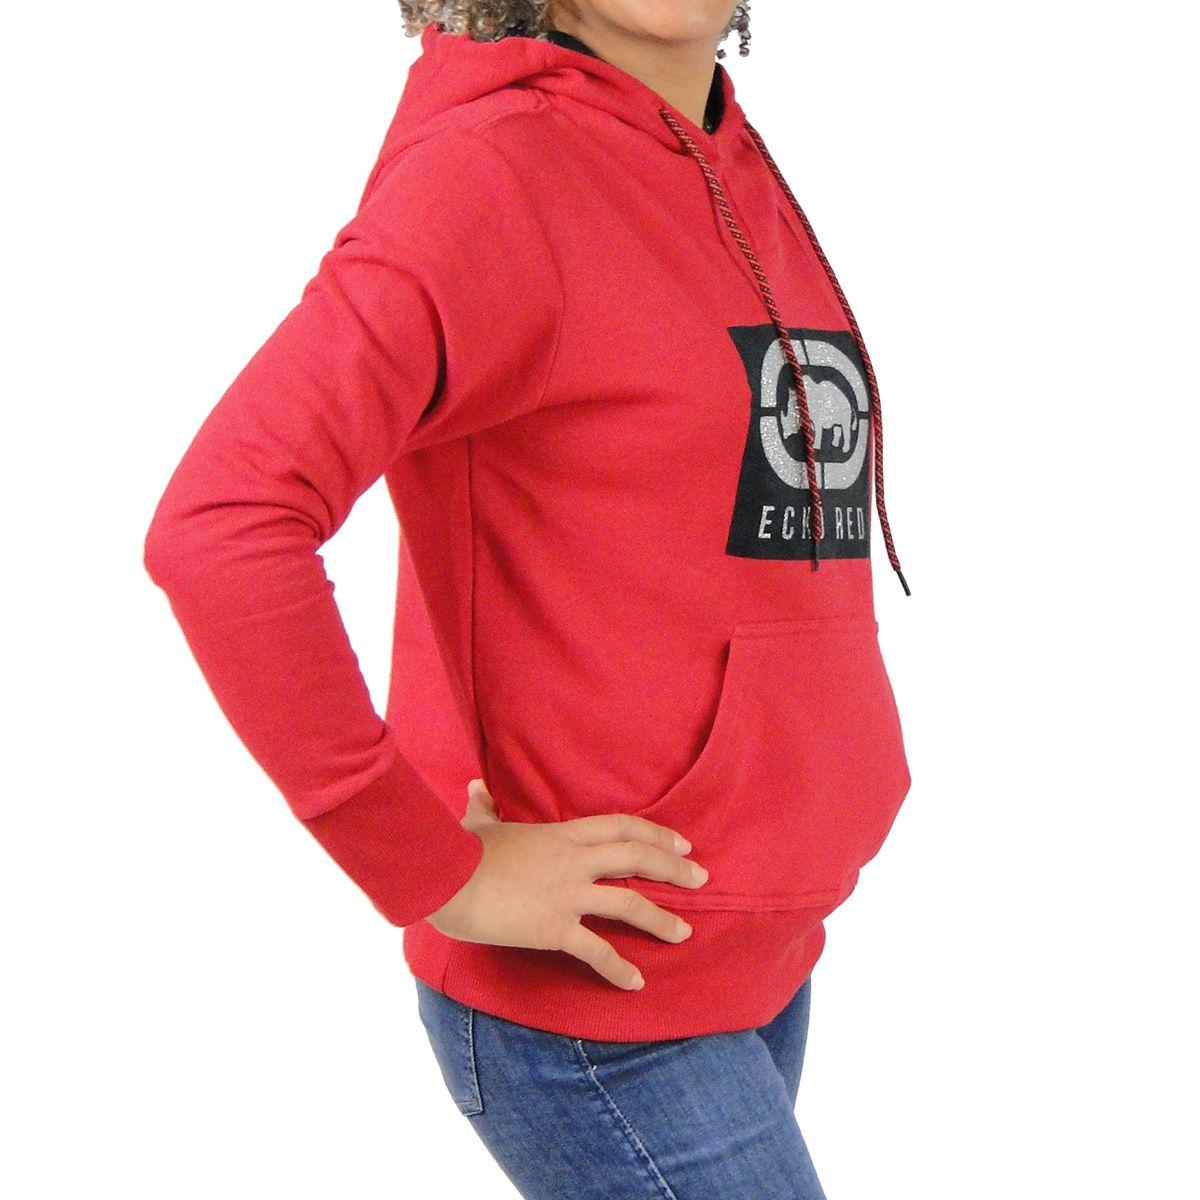 Jaqueta Ecko Feminina Logotipo Vermelha